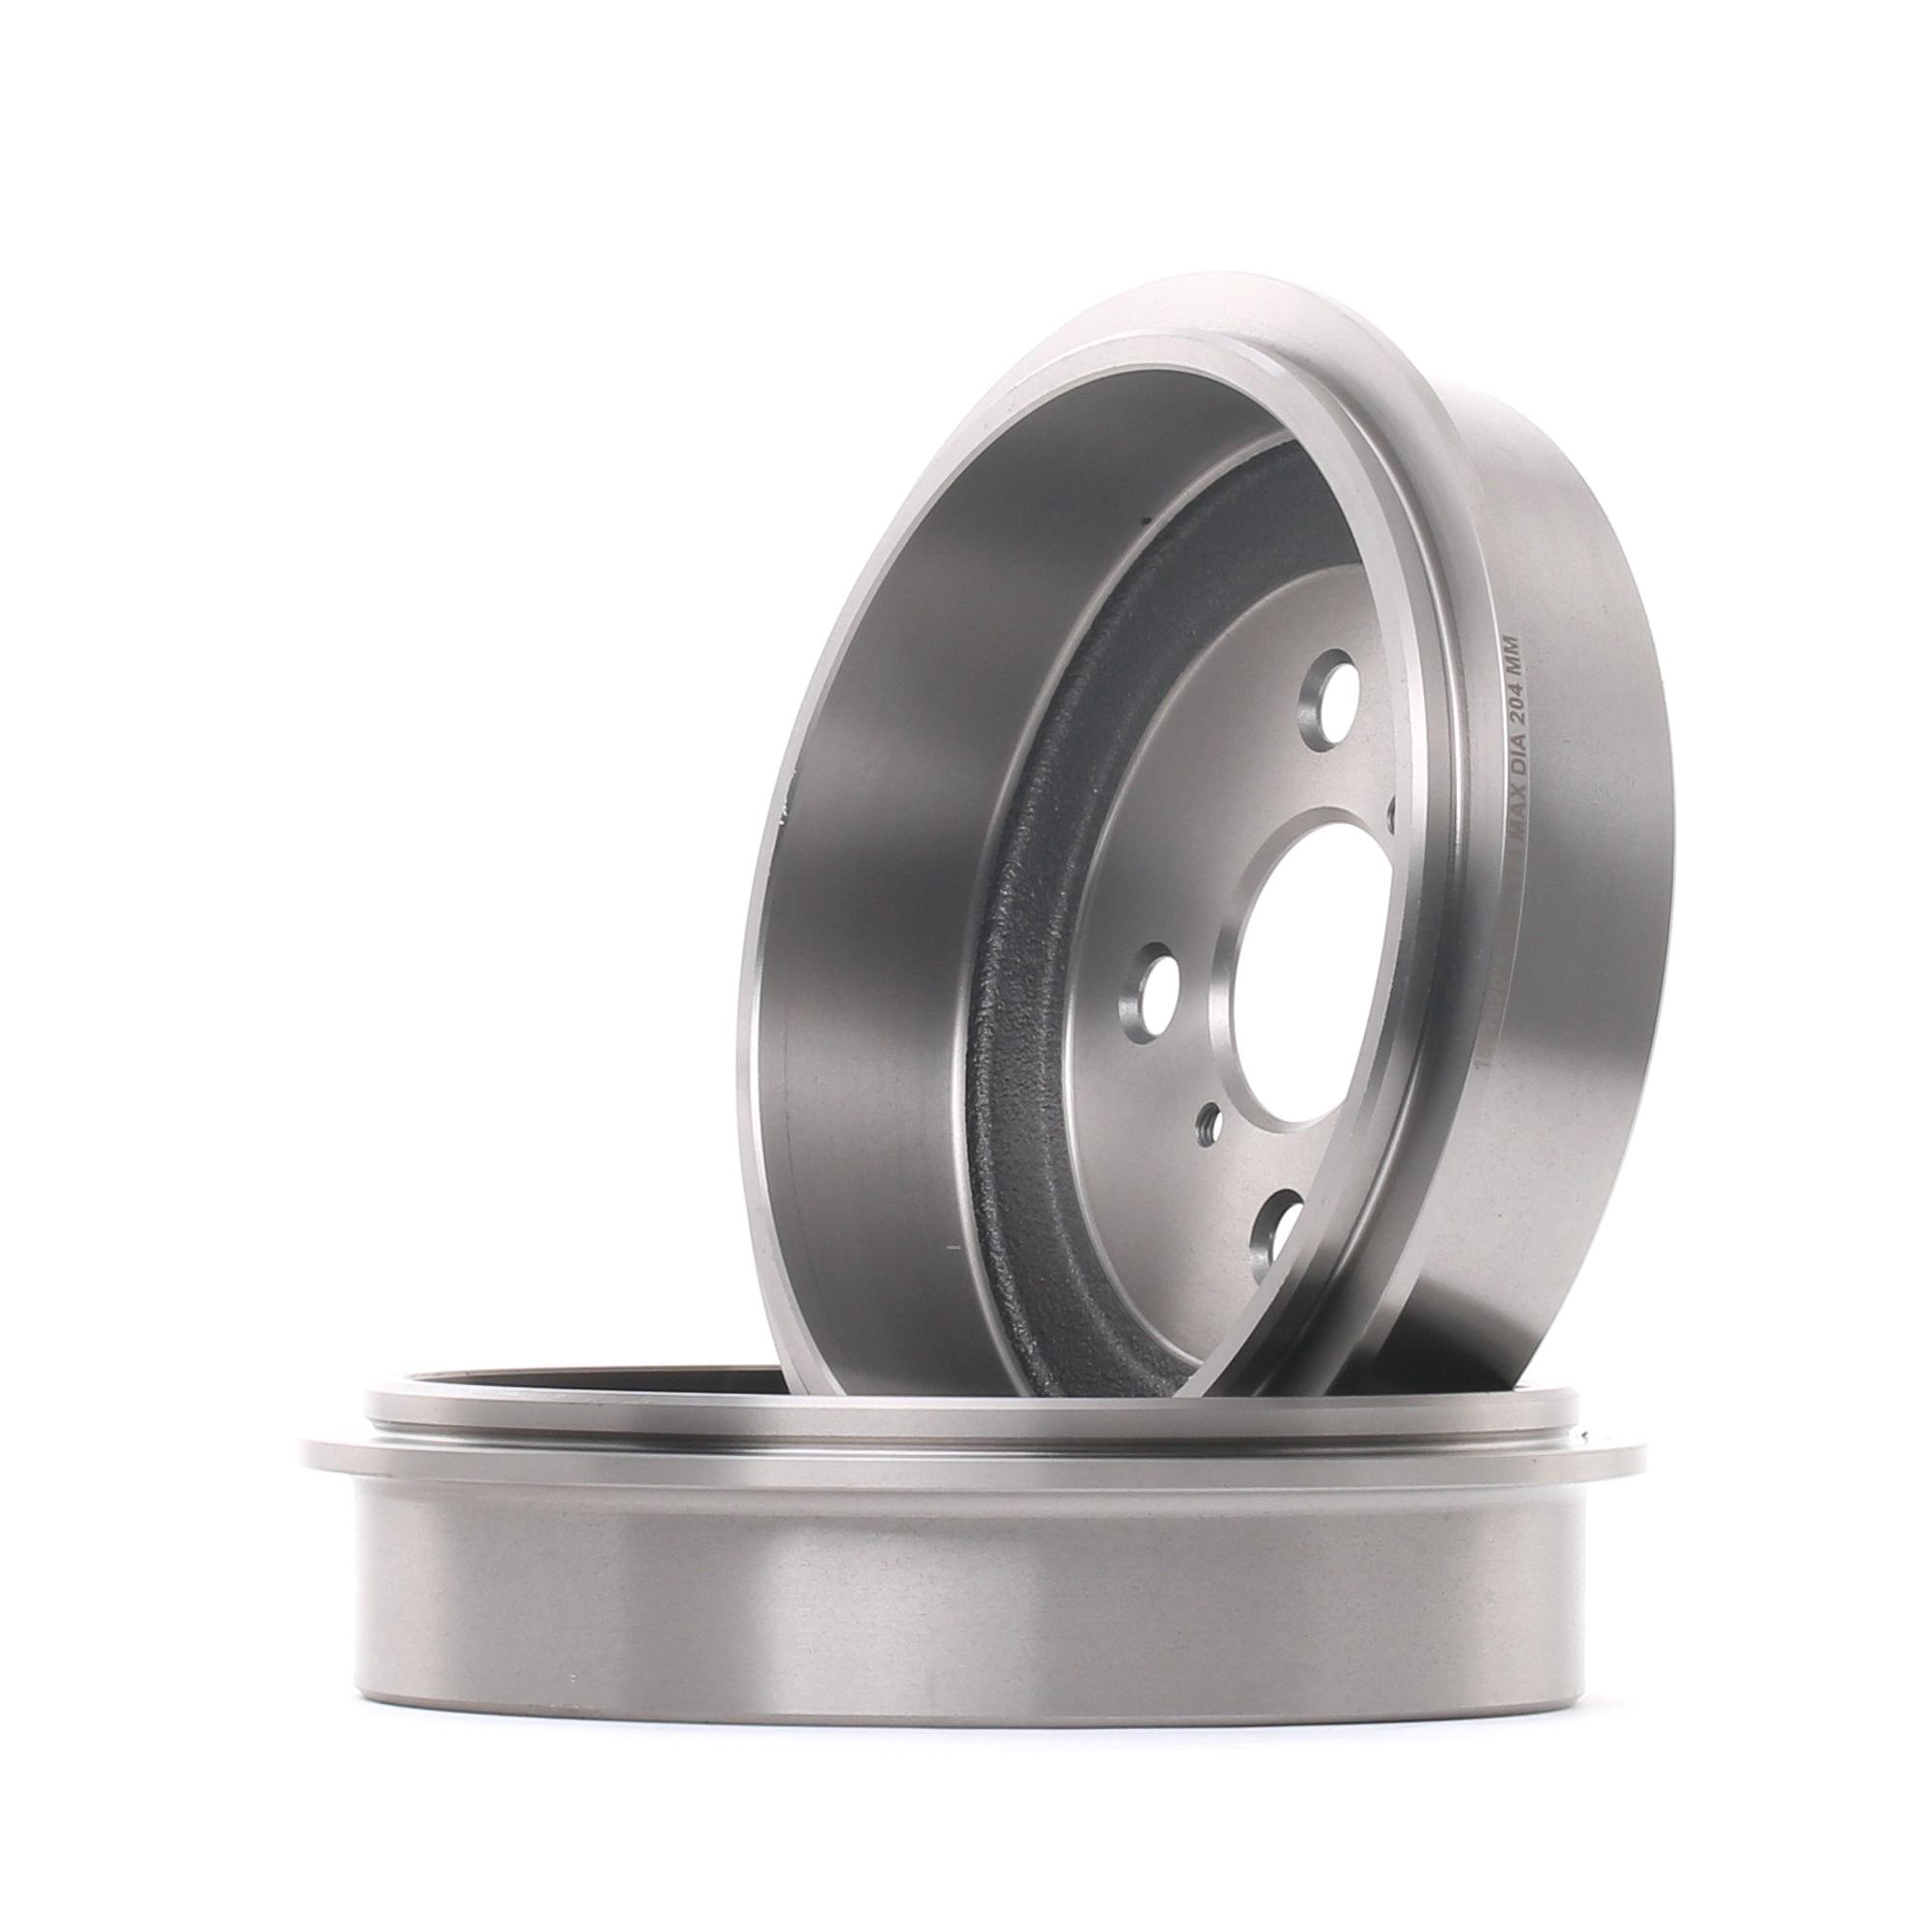 RIDEX: Original Bremsbelagsatz Trommelbremse 123B0158 ()